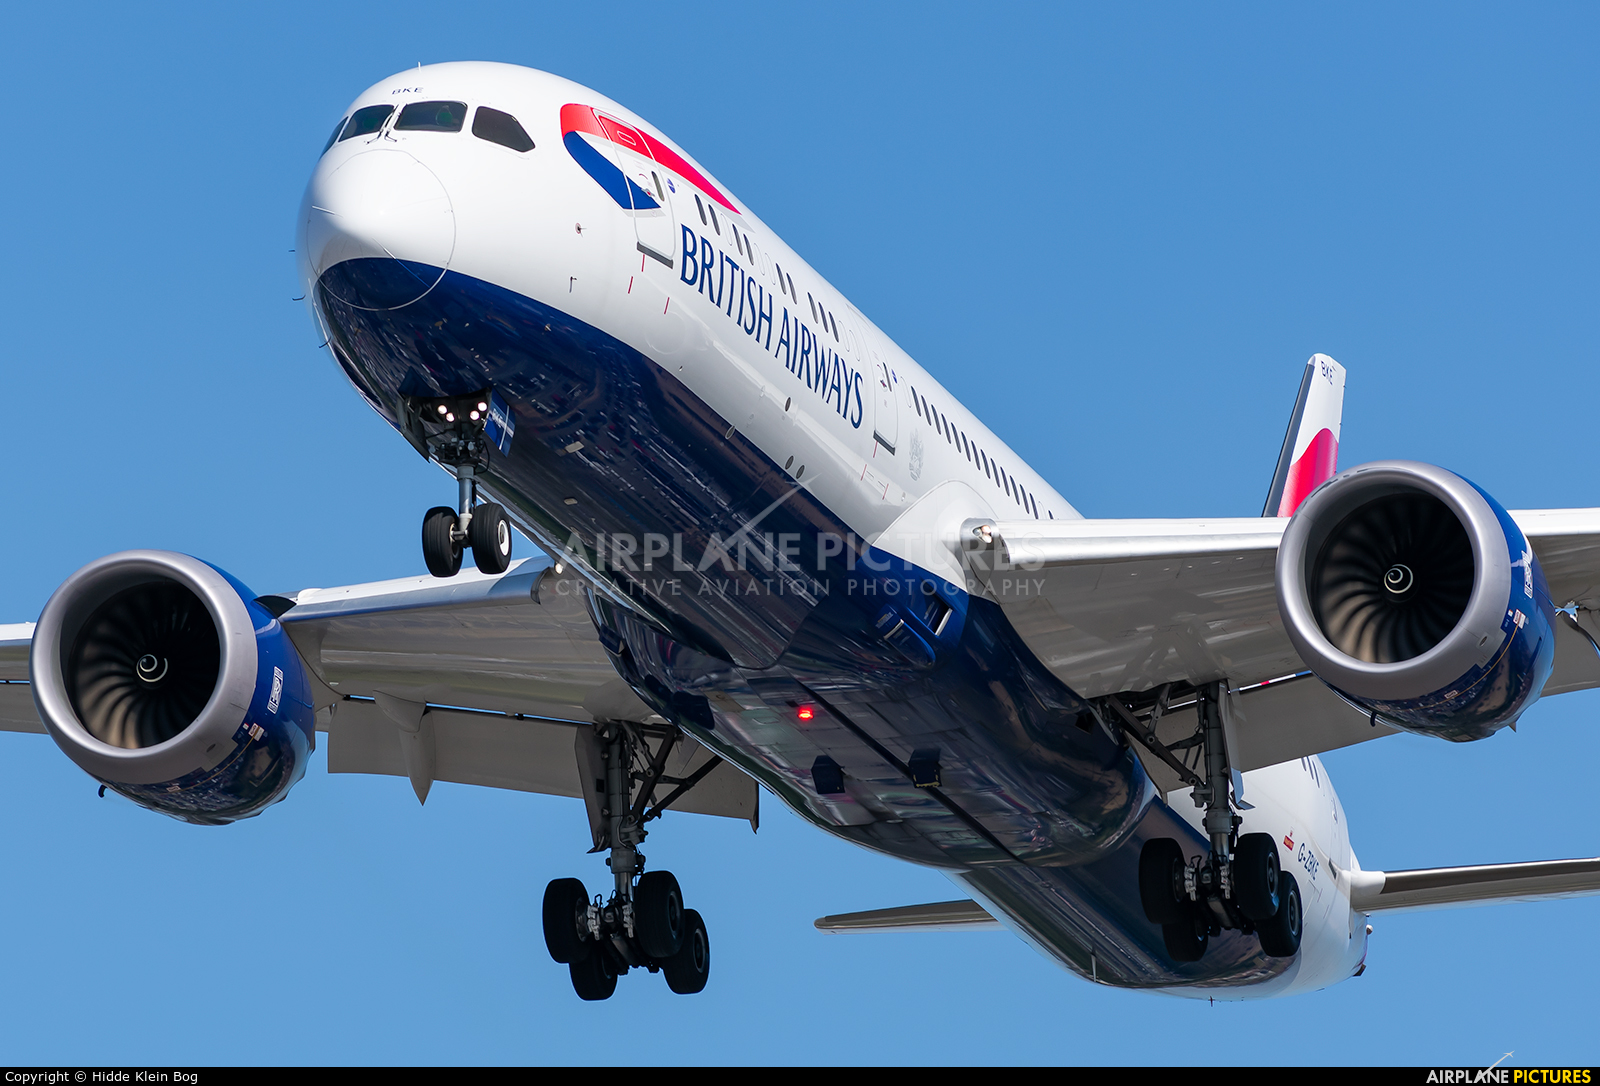 British Airways G-ZBKE aircraft at London - Heathrow